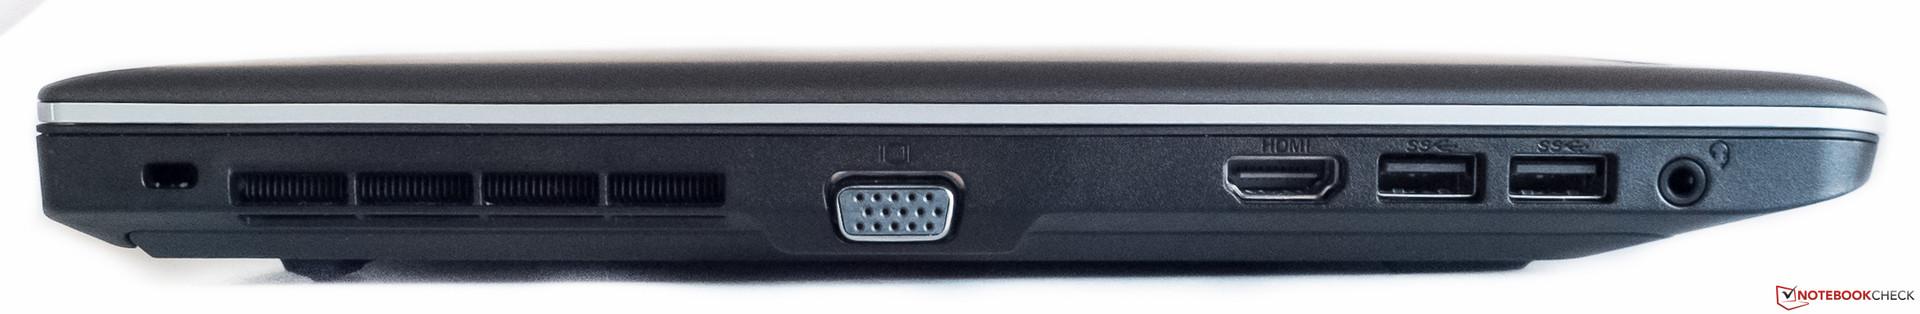 Review Lenovo ThinkPad Edge E540 20C60041 Notebook - NotebookCheck